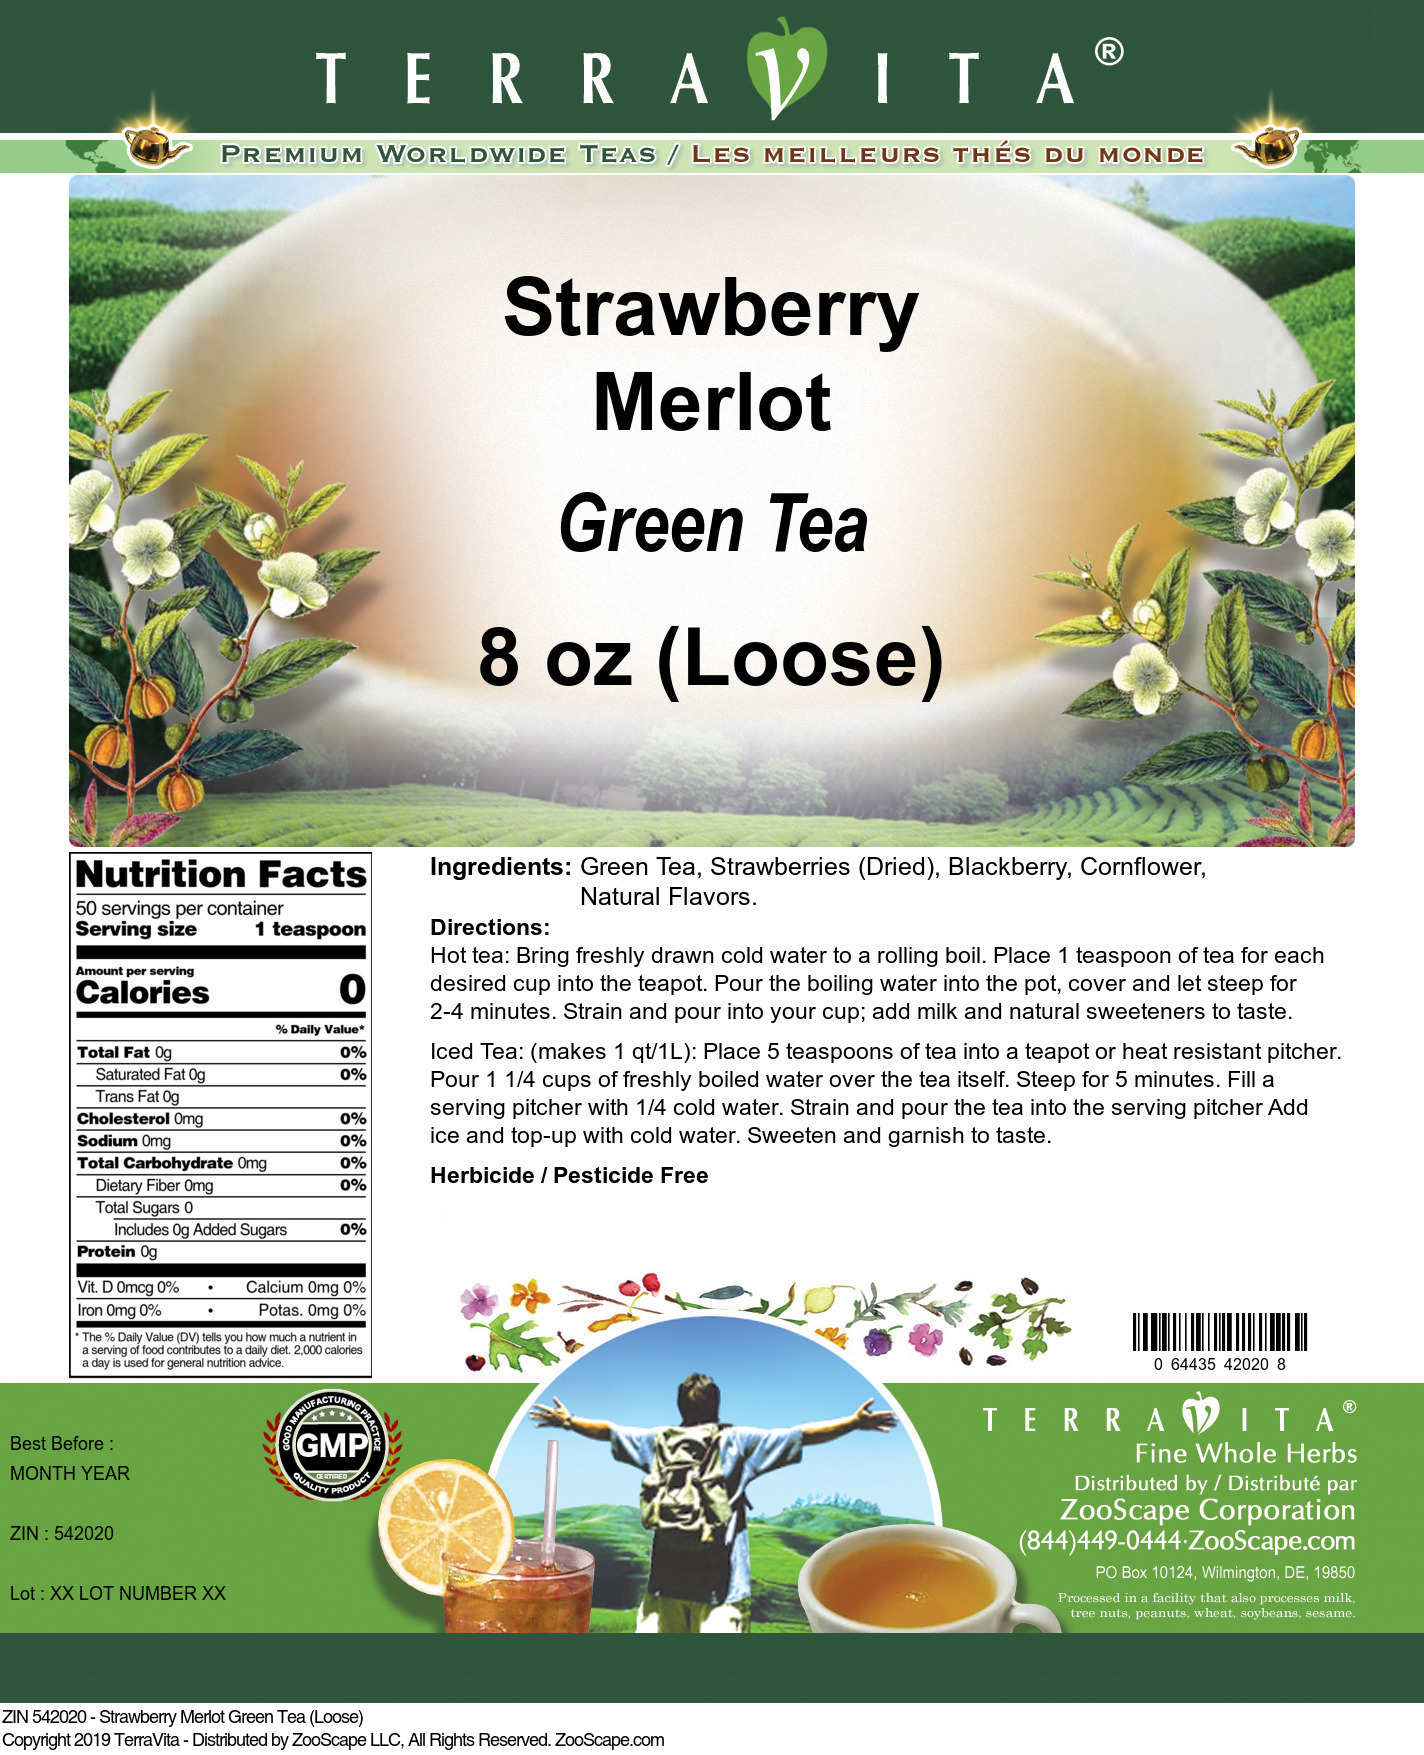 Strawberry Merlot Green Tea (Loose)